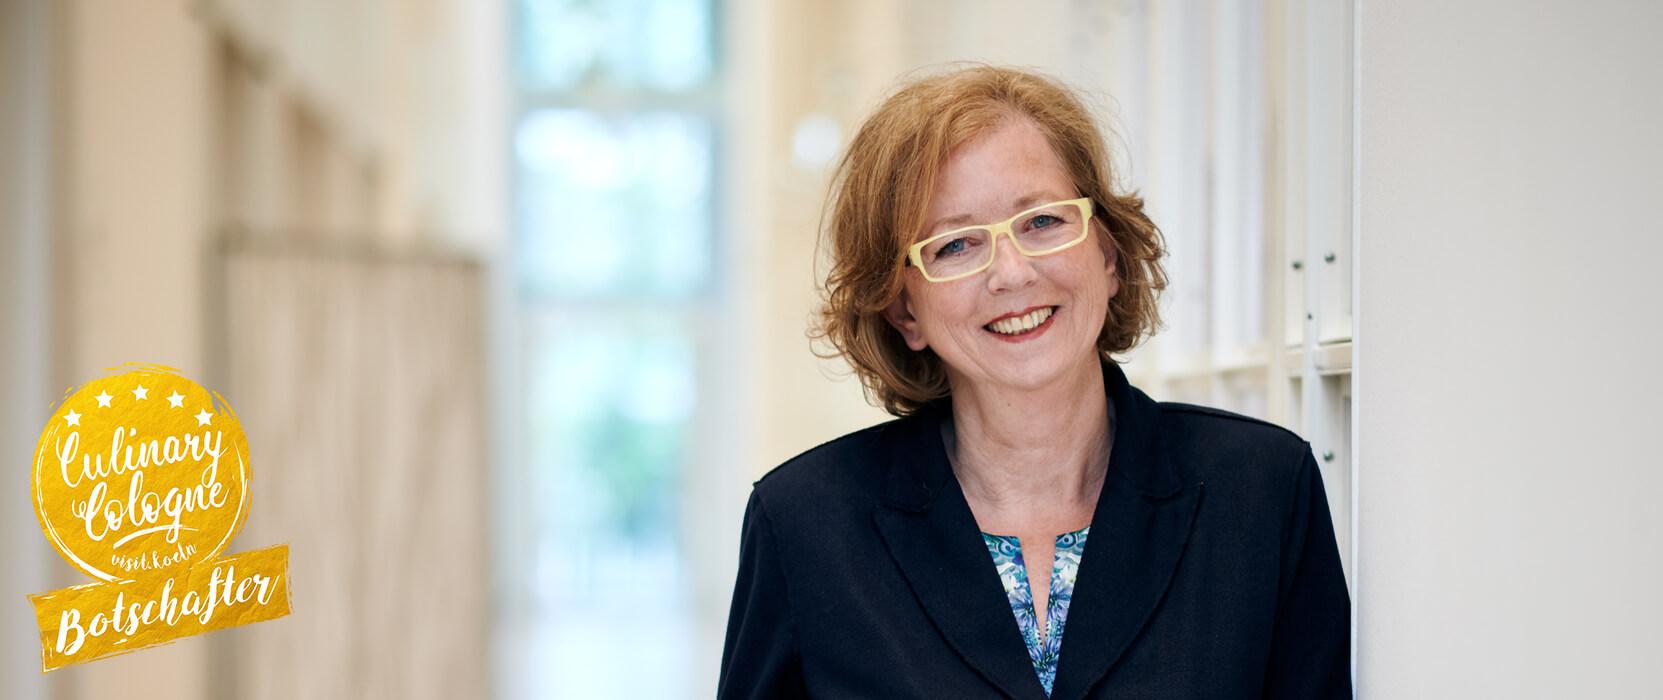 Jutta Kirberg - #culinarycologne-Botschafter